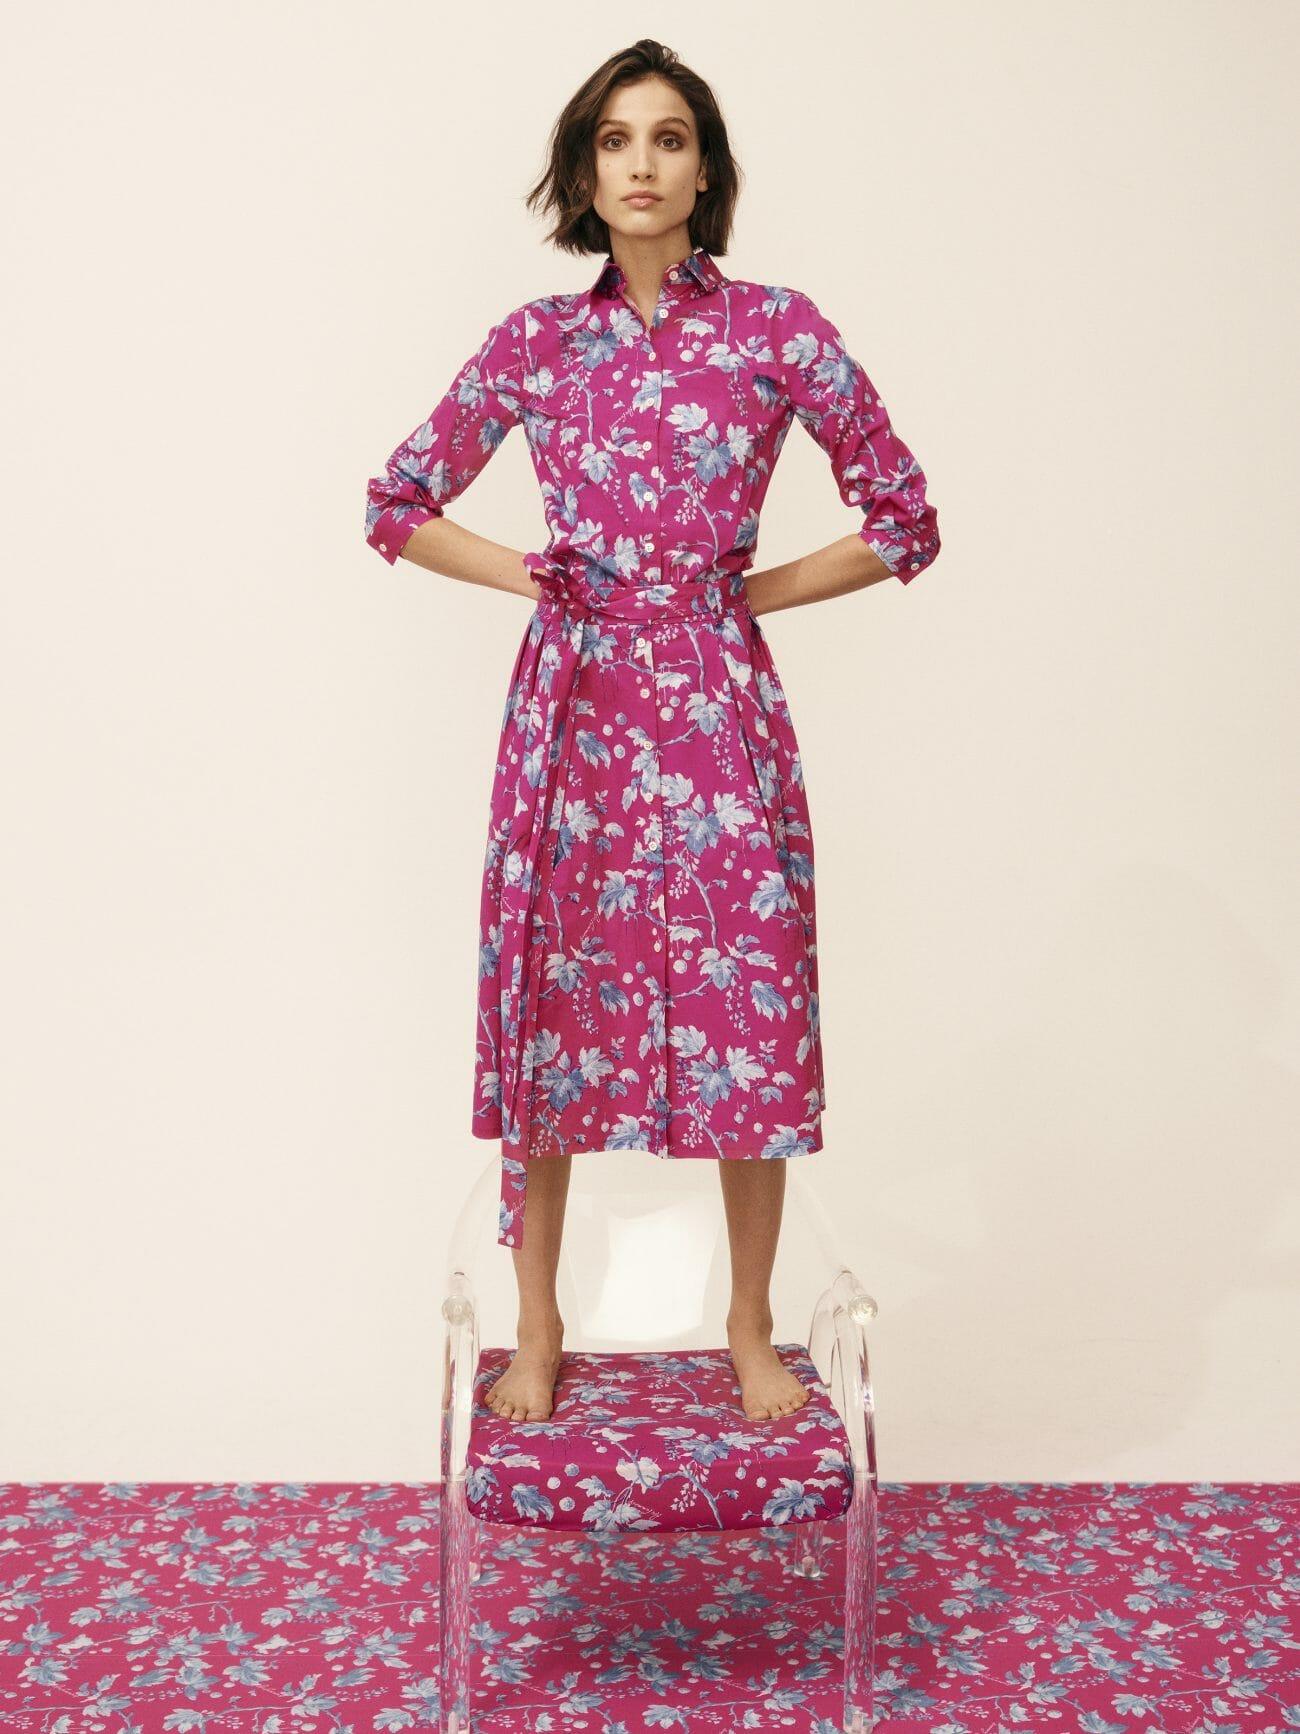 carolina herrera new york model wearing pink flower dress